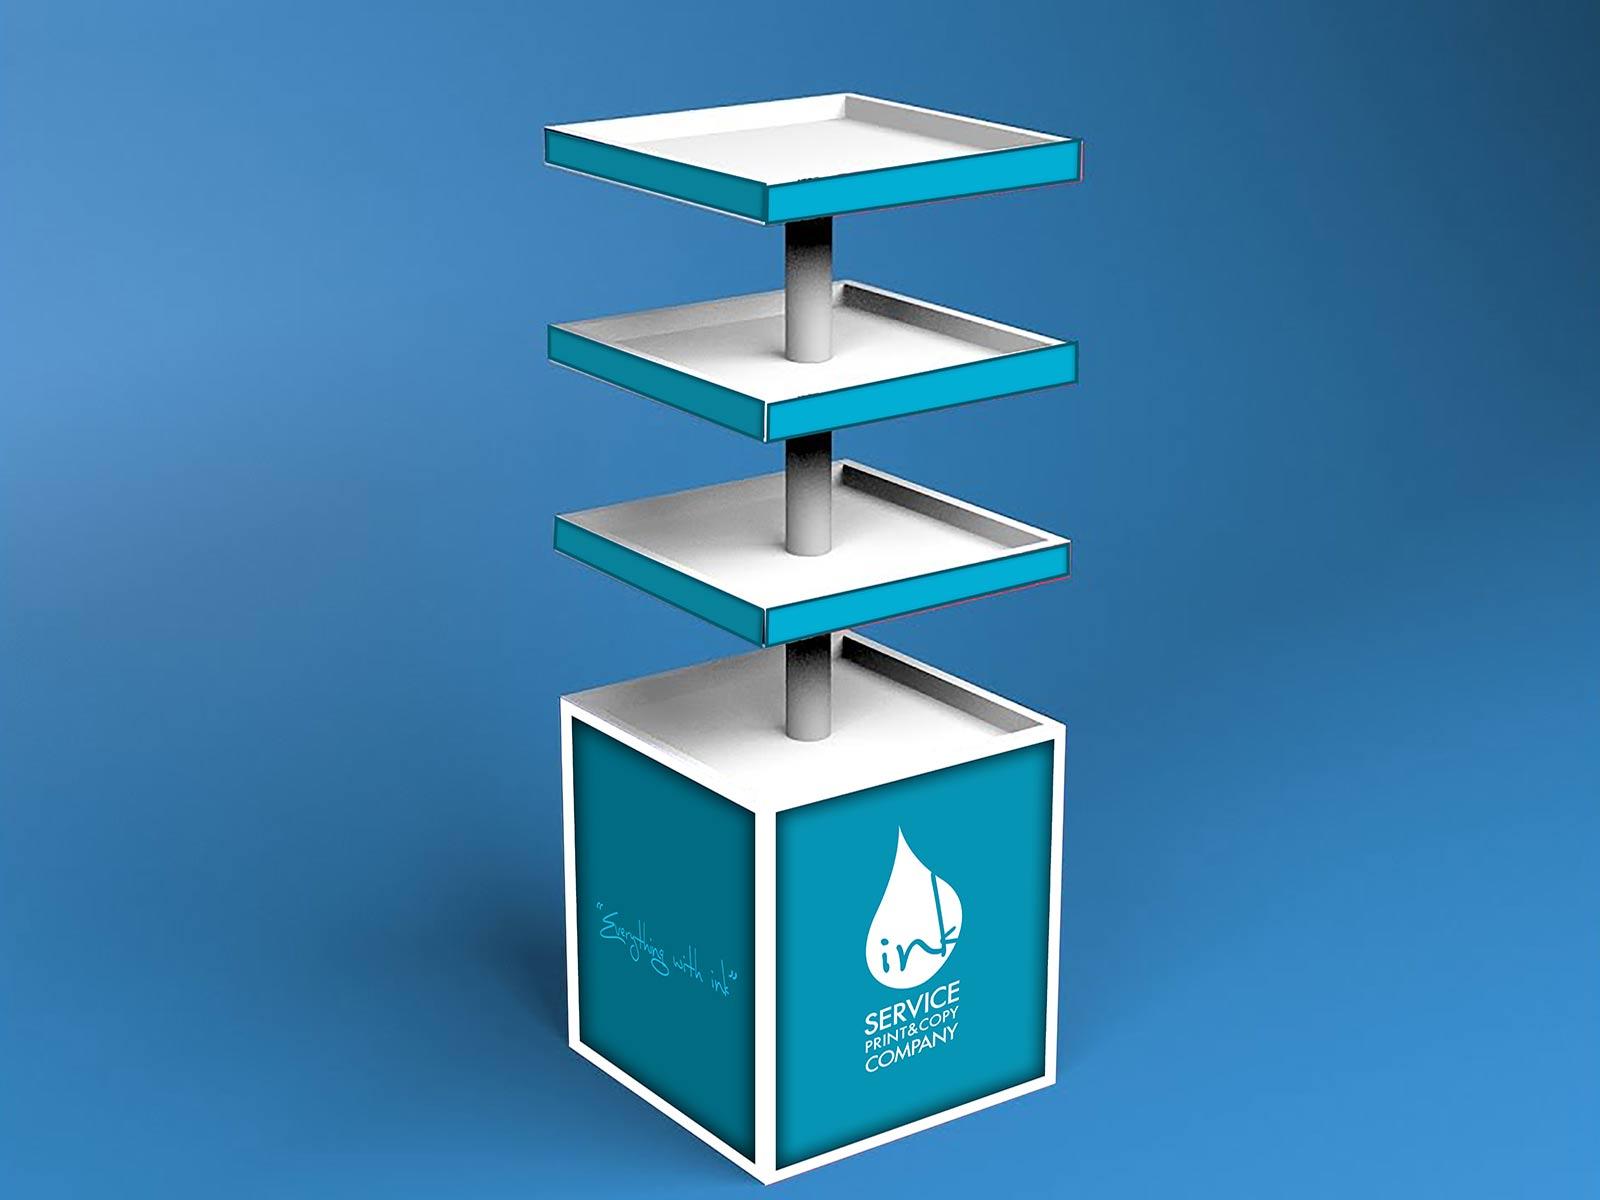 Productstand_01_inkservice-kuwait